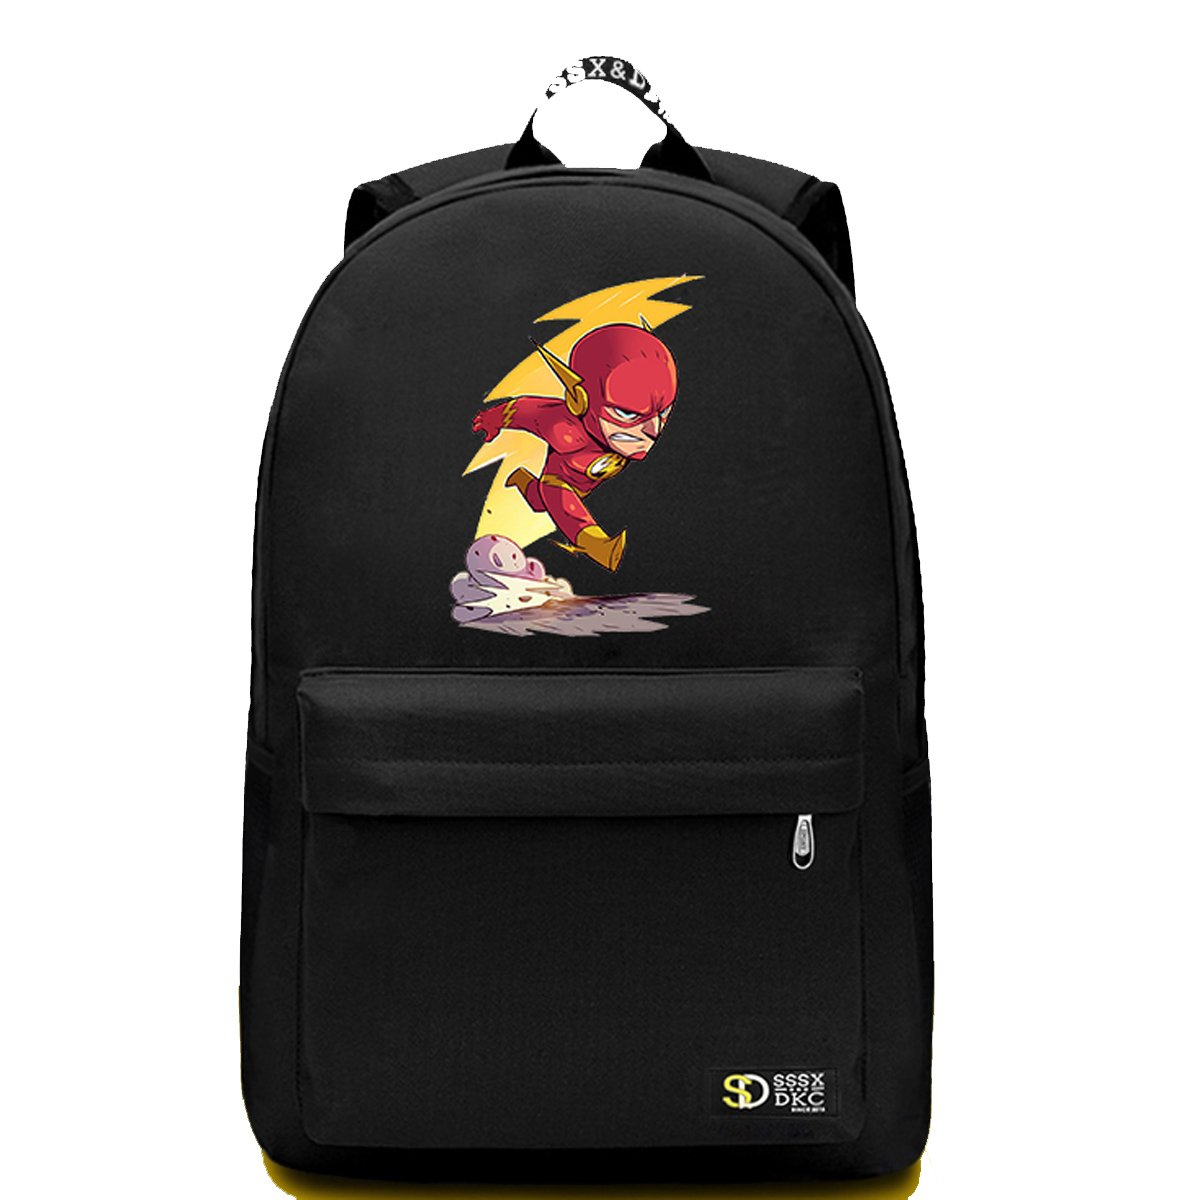 7fe77a82332 Amazon.com   YOURNELO Leisure DC Comics Marvel Heroes High Capacity  Rucksack School Backpack Bookbag